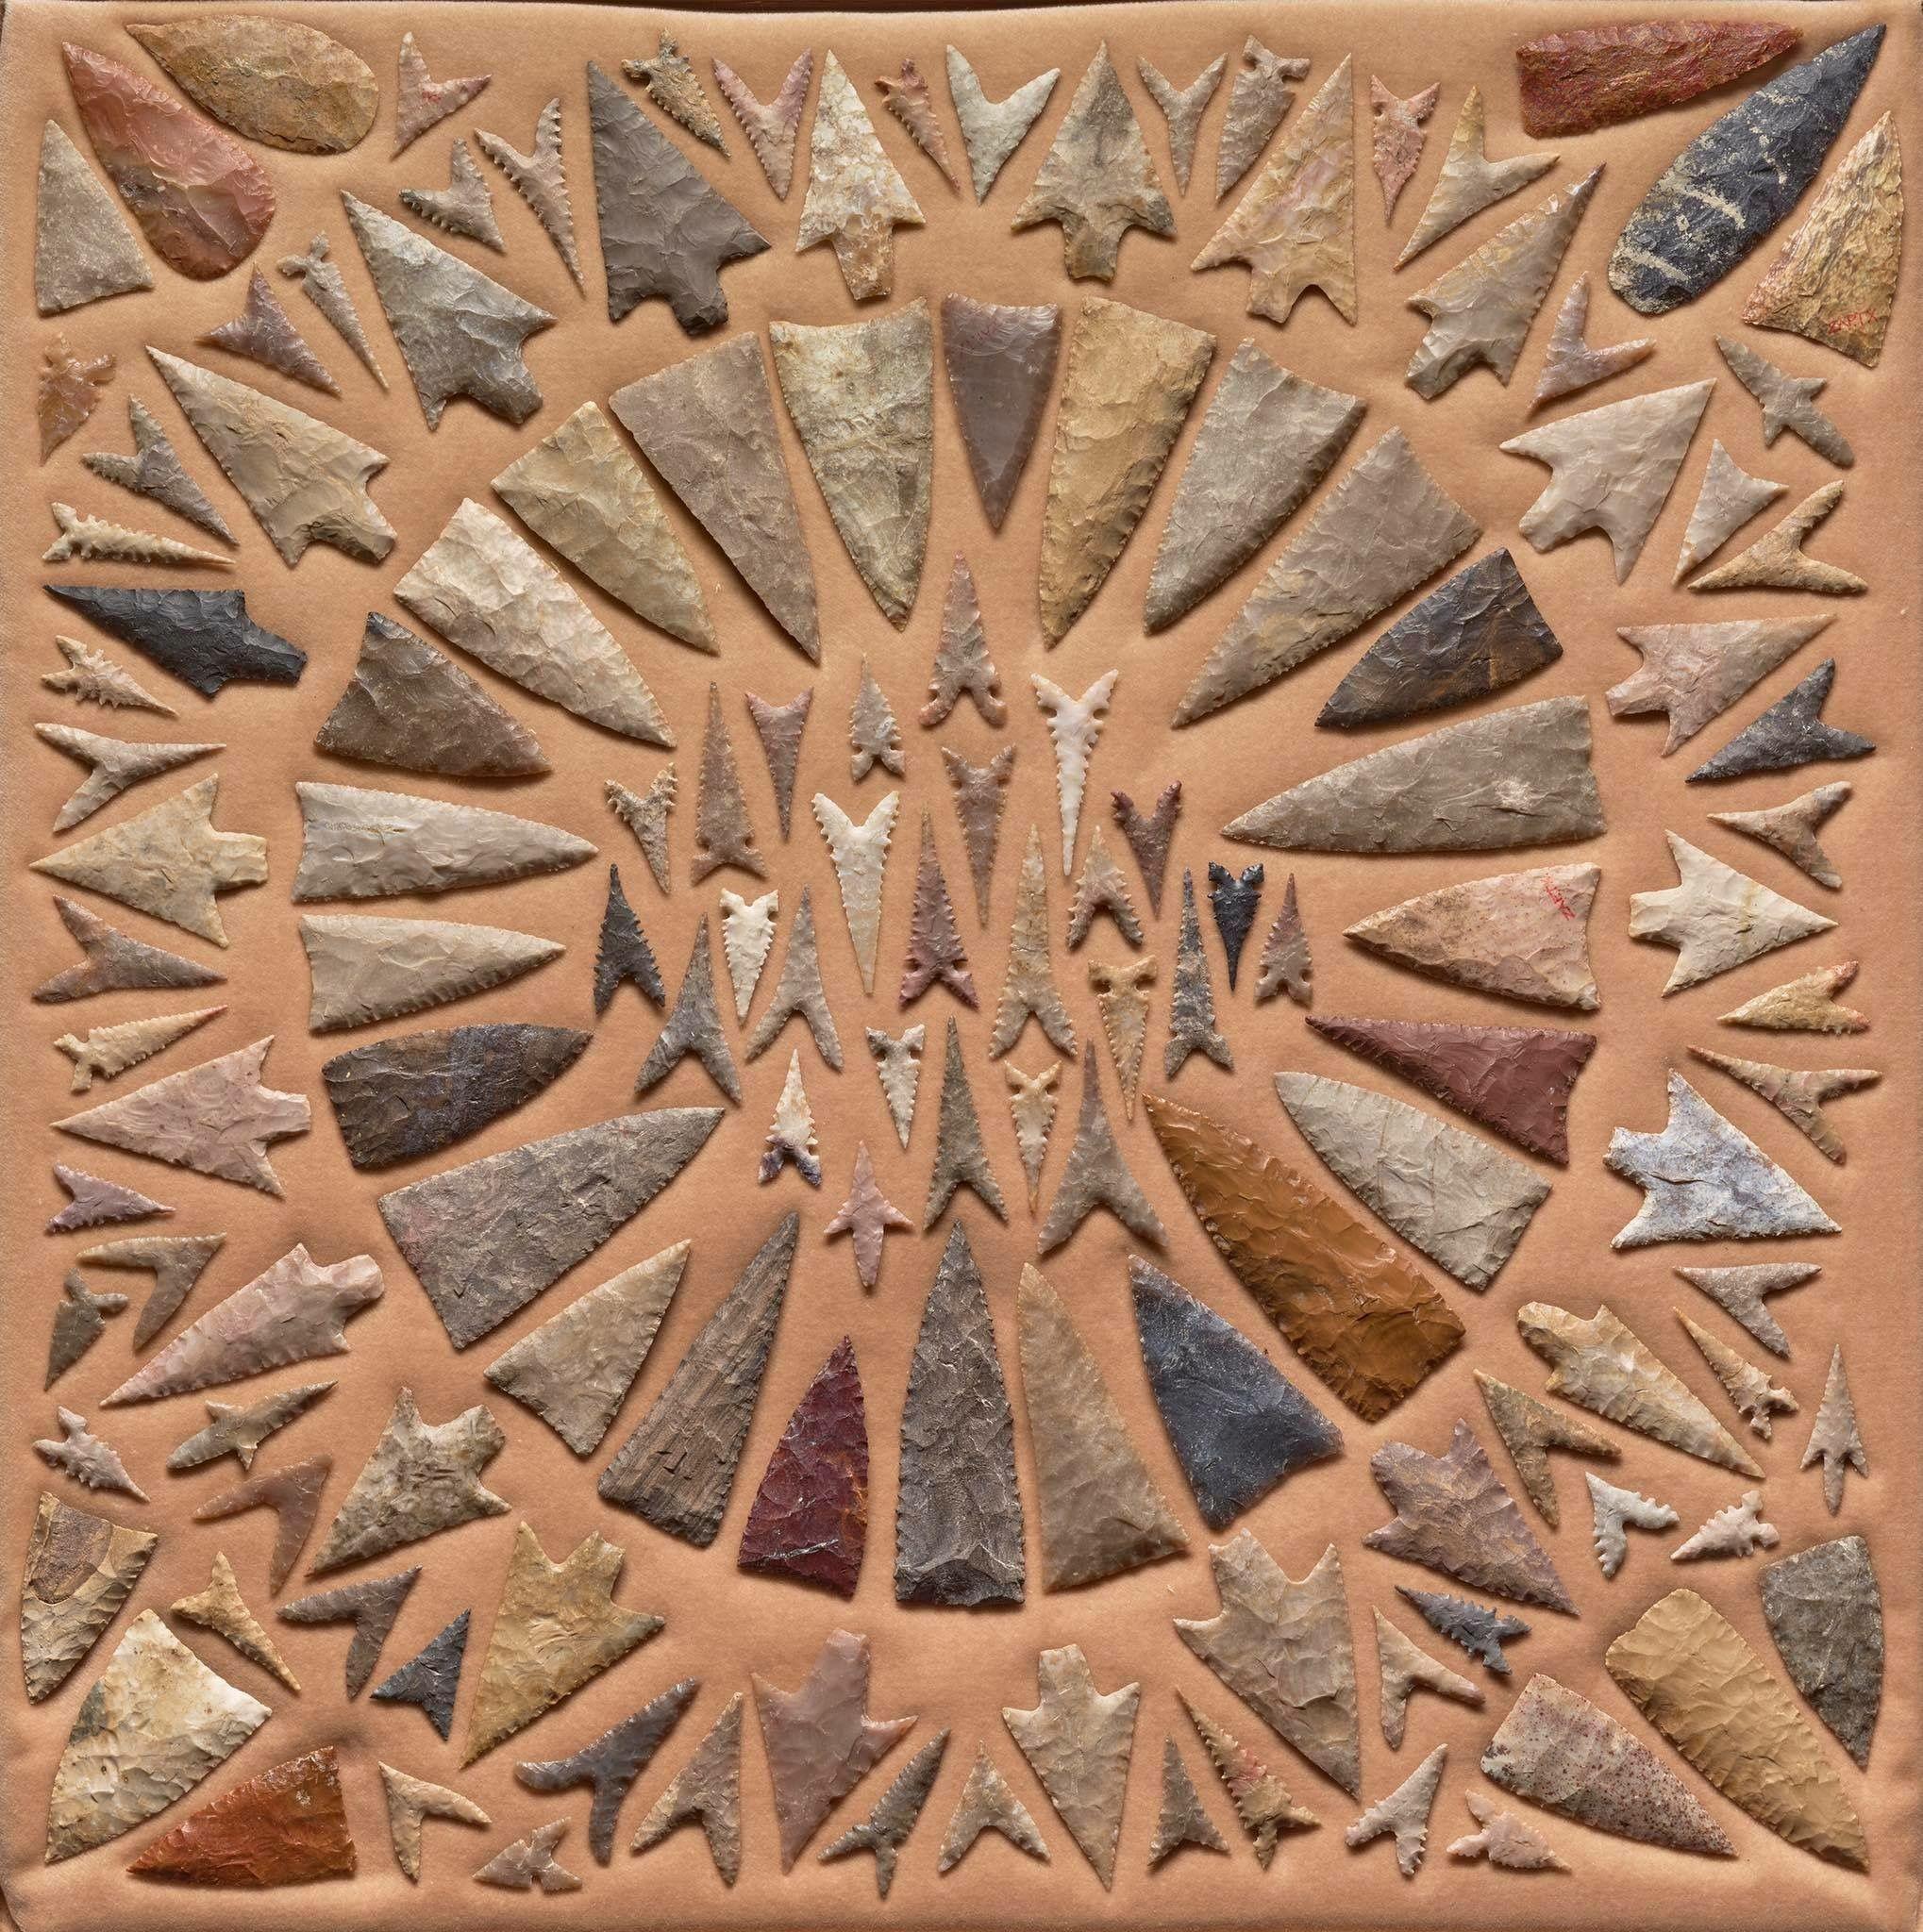 brown county texas arrowheads